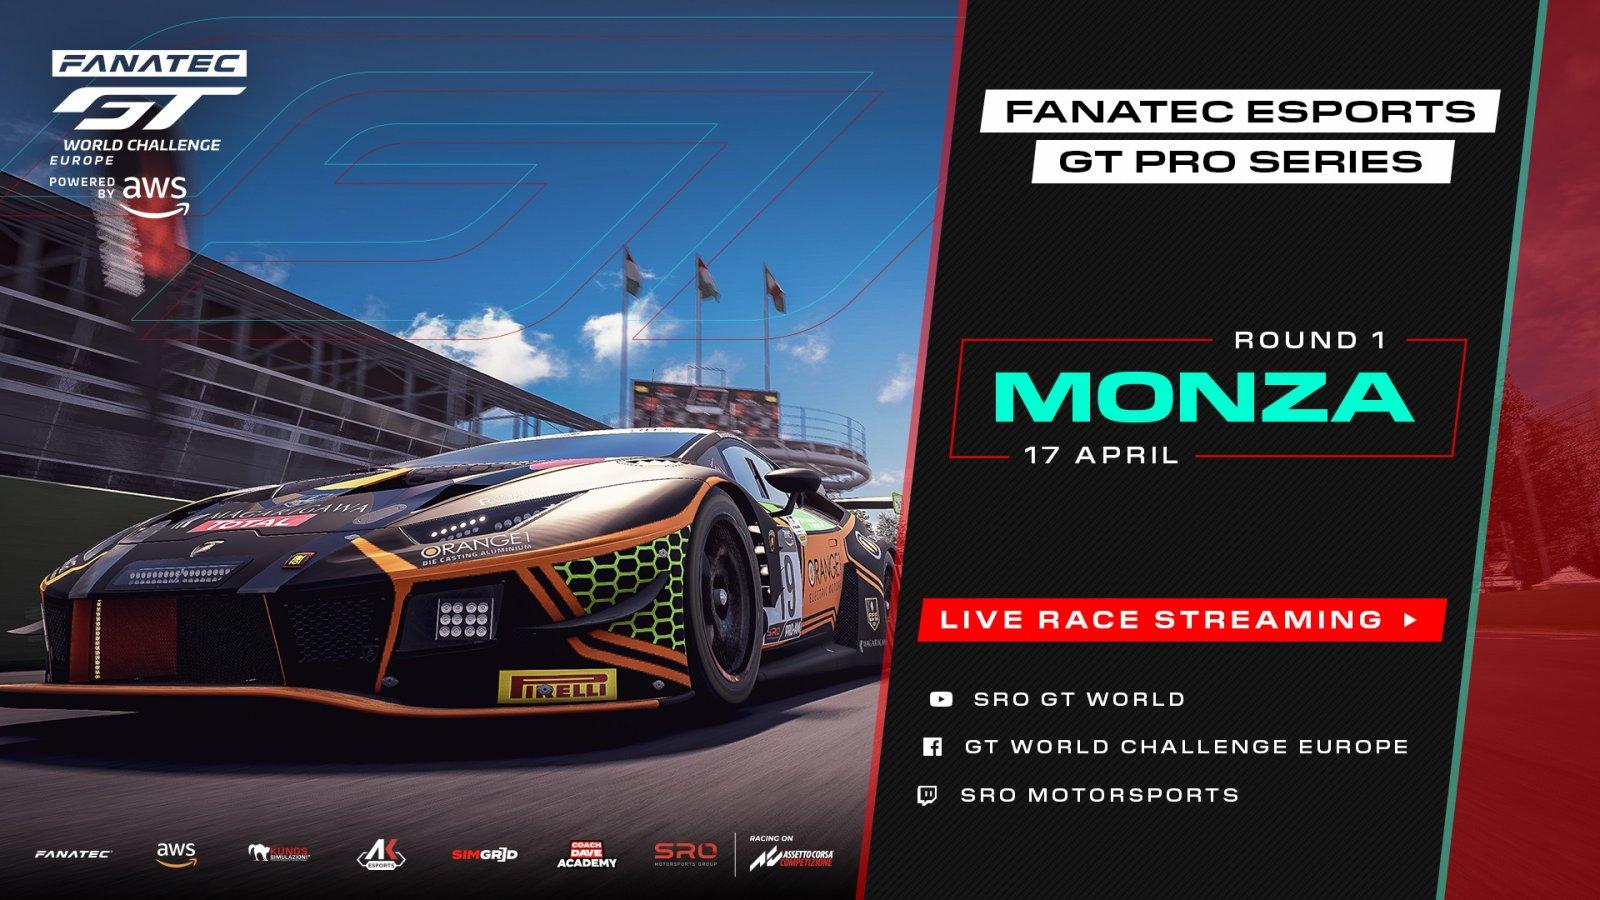 Fanatec Esports GT Pro Series heralds new era for sim racing at Monza